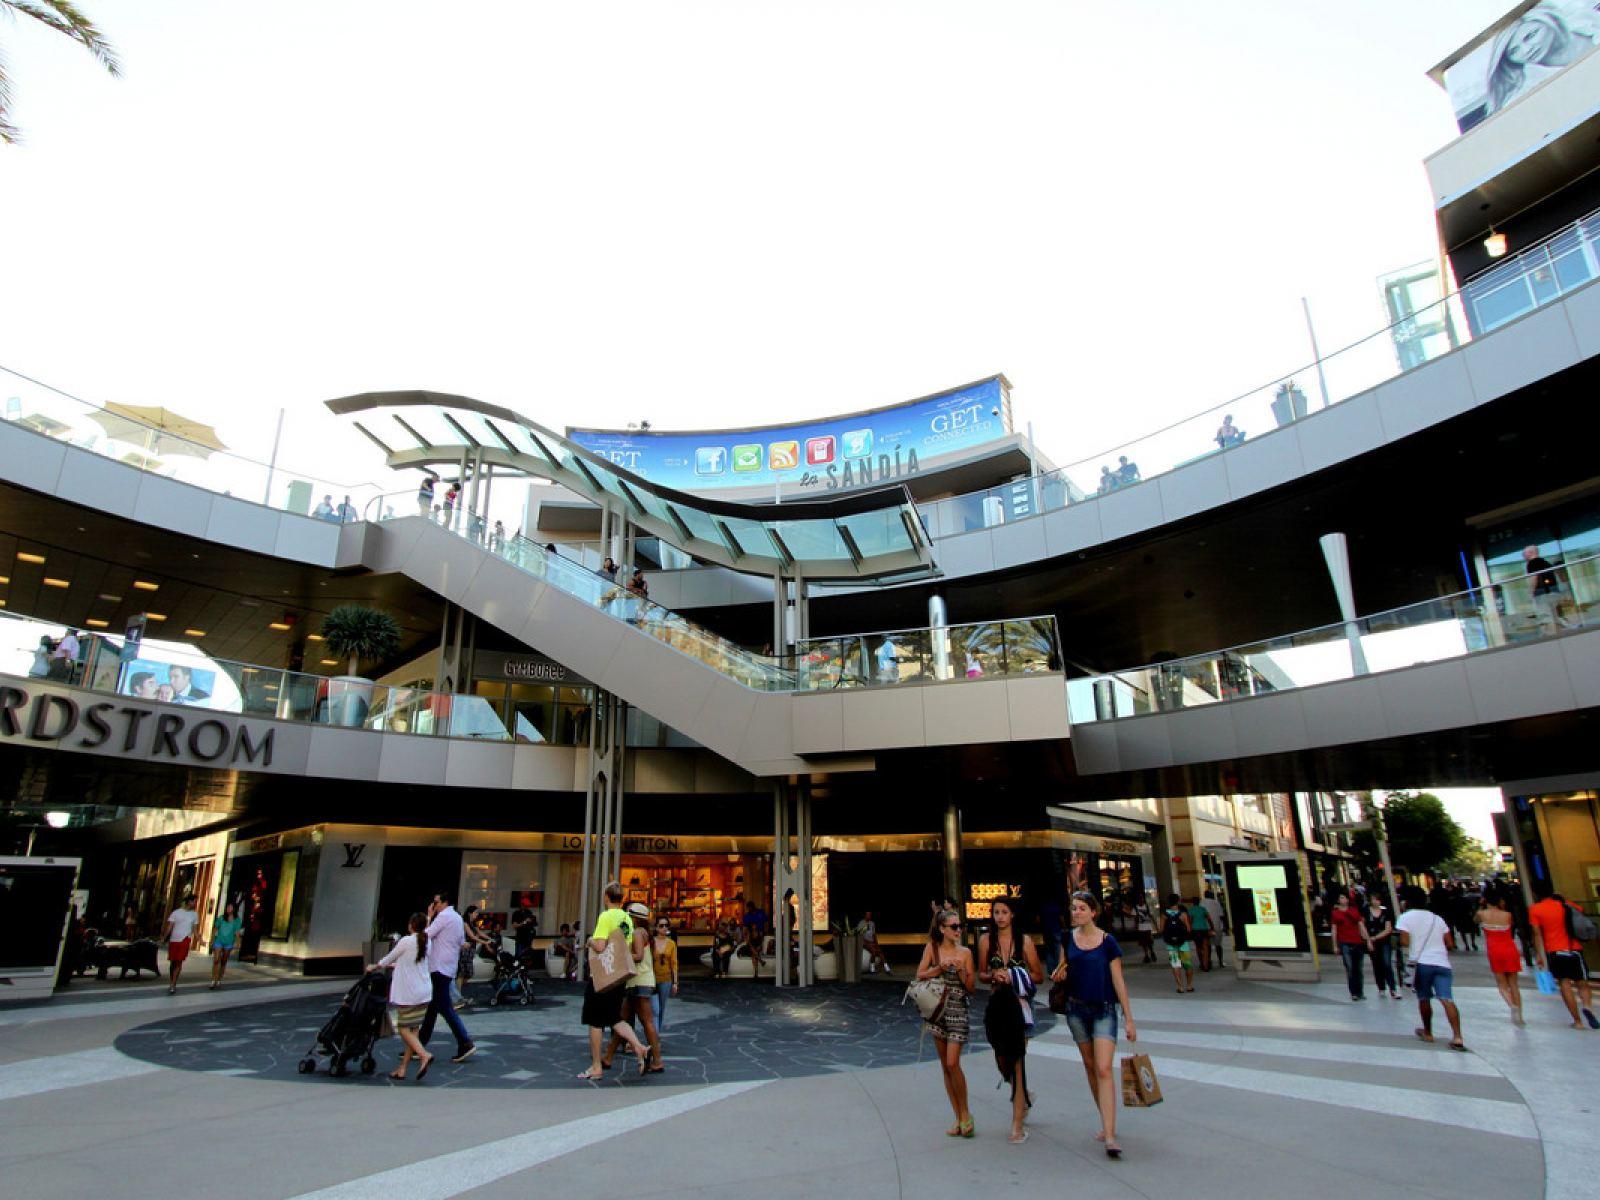 Main image for article titled Compras em Los Angeles: Santa Mônica Place